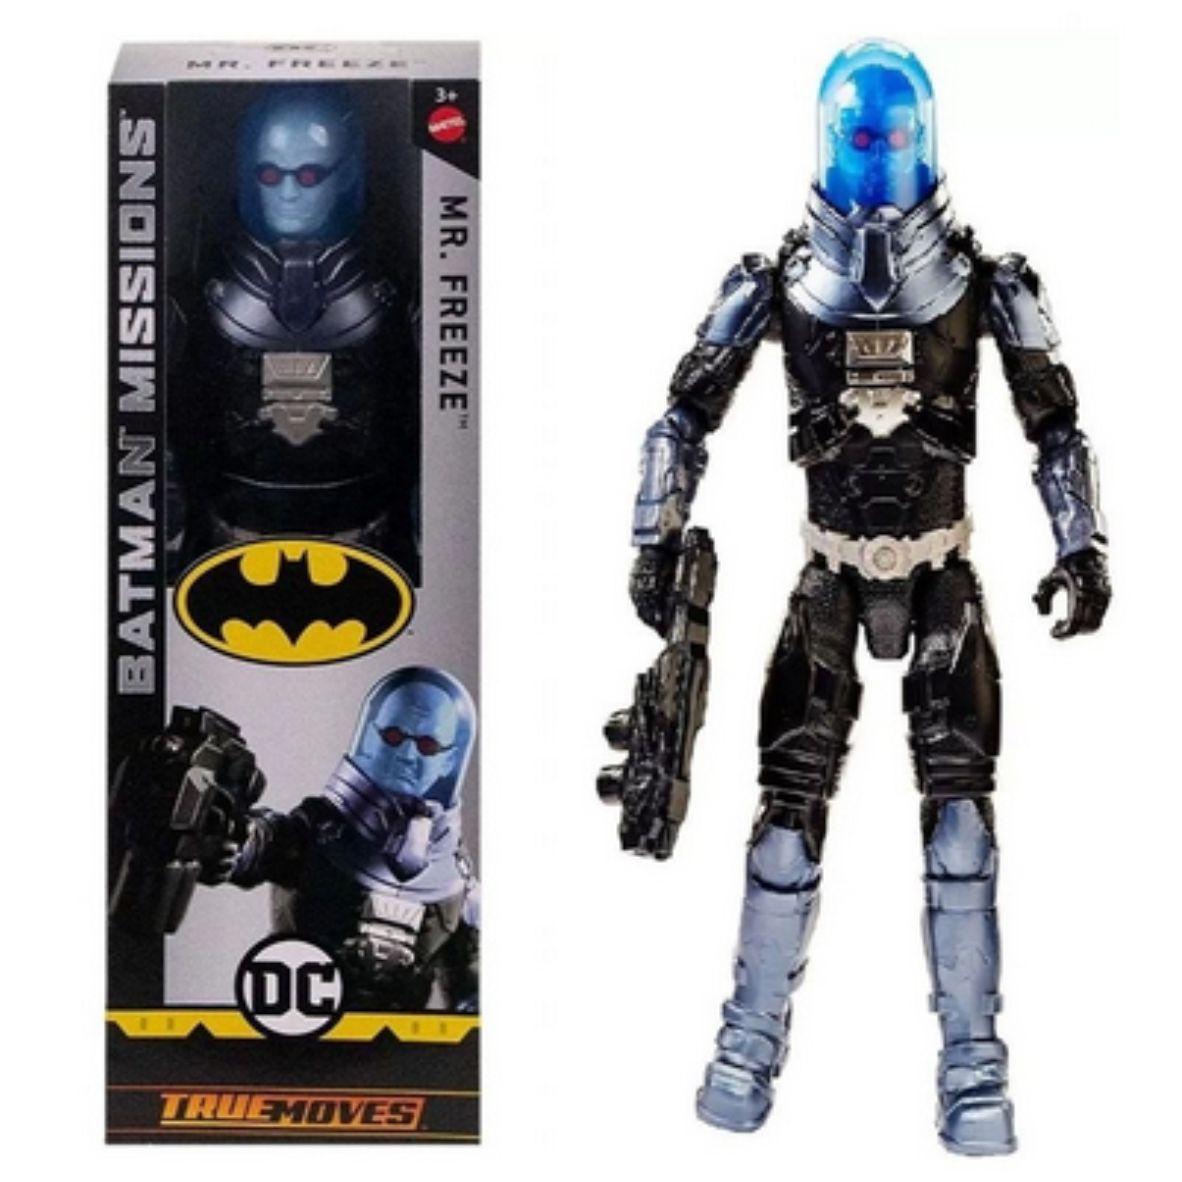 Batman Missions Mr. Freeze